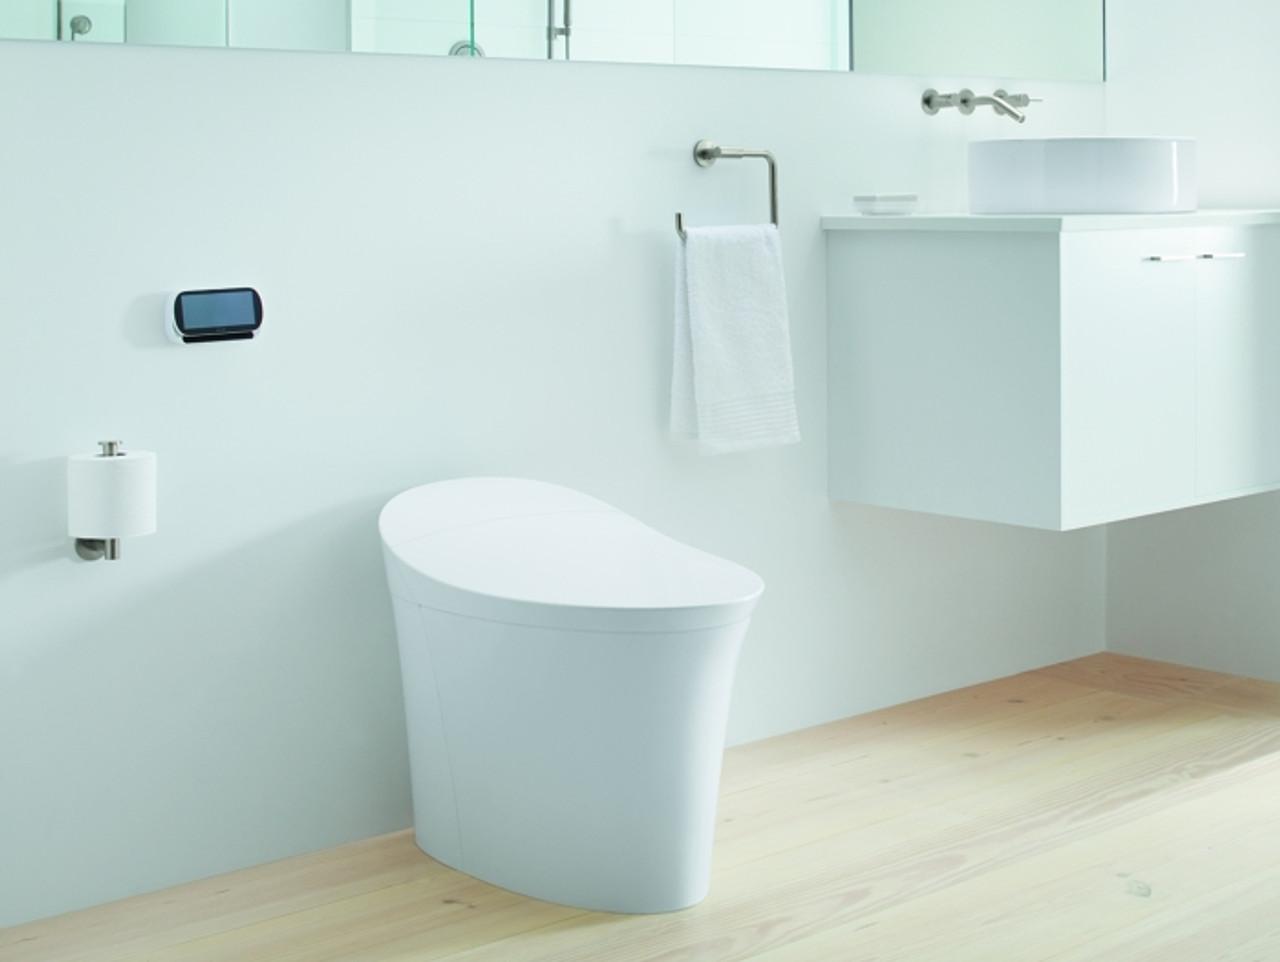 kohler veil intelligent skirted one piece elongated dual flush toilet